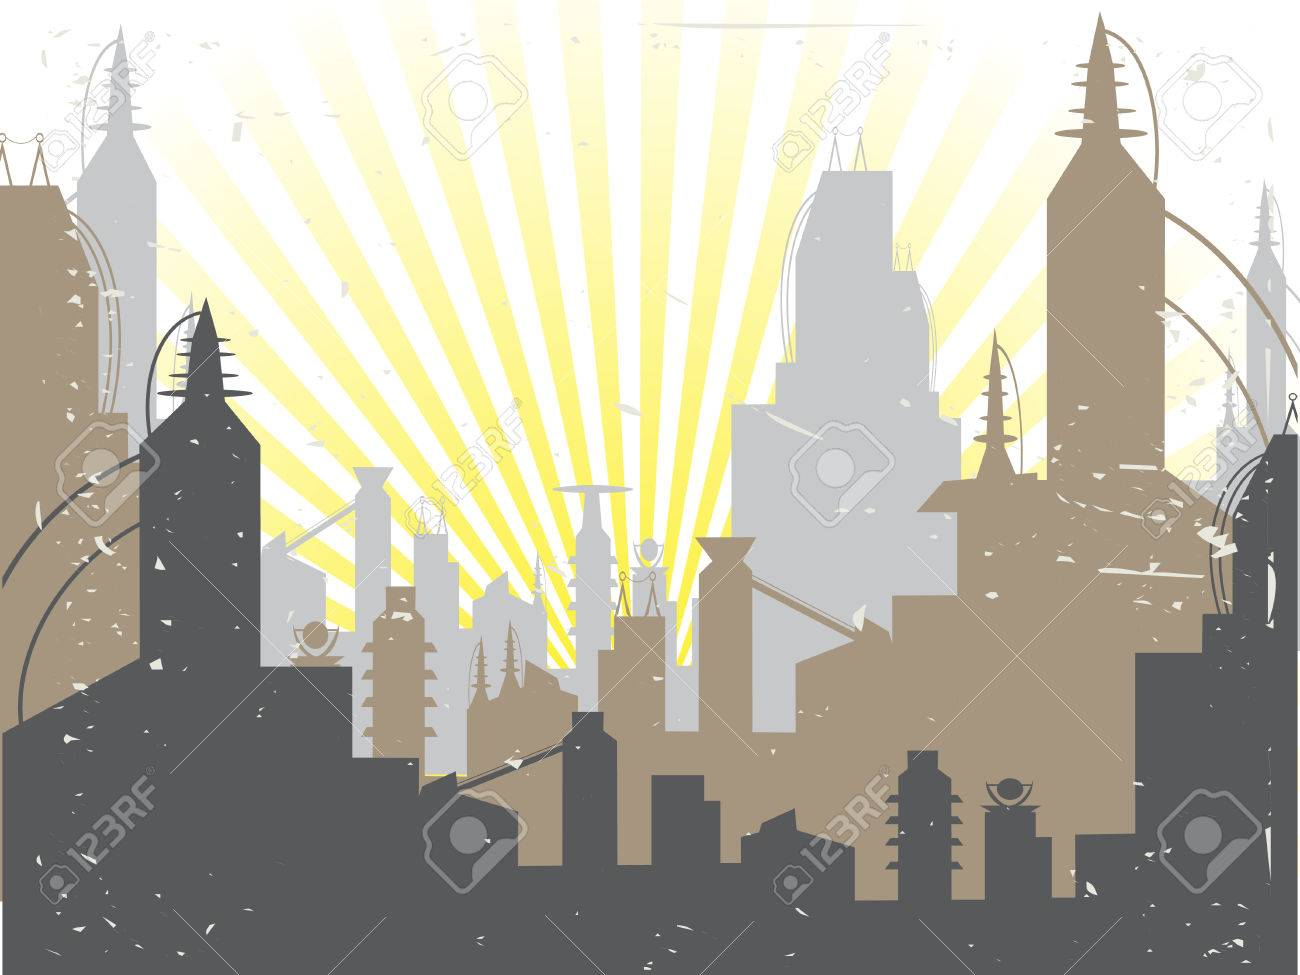 Scifi Grunge Future City sun rising - Vector Background Stock Vector - 5185687